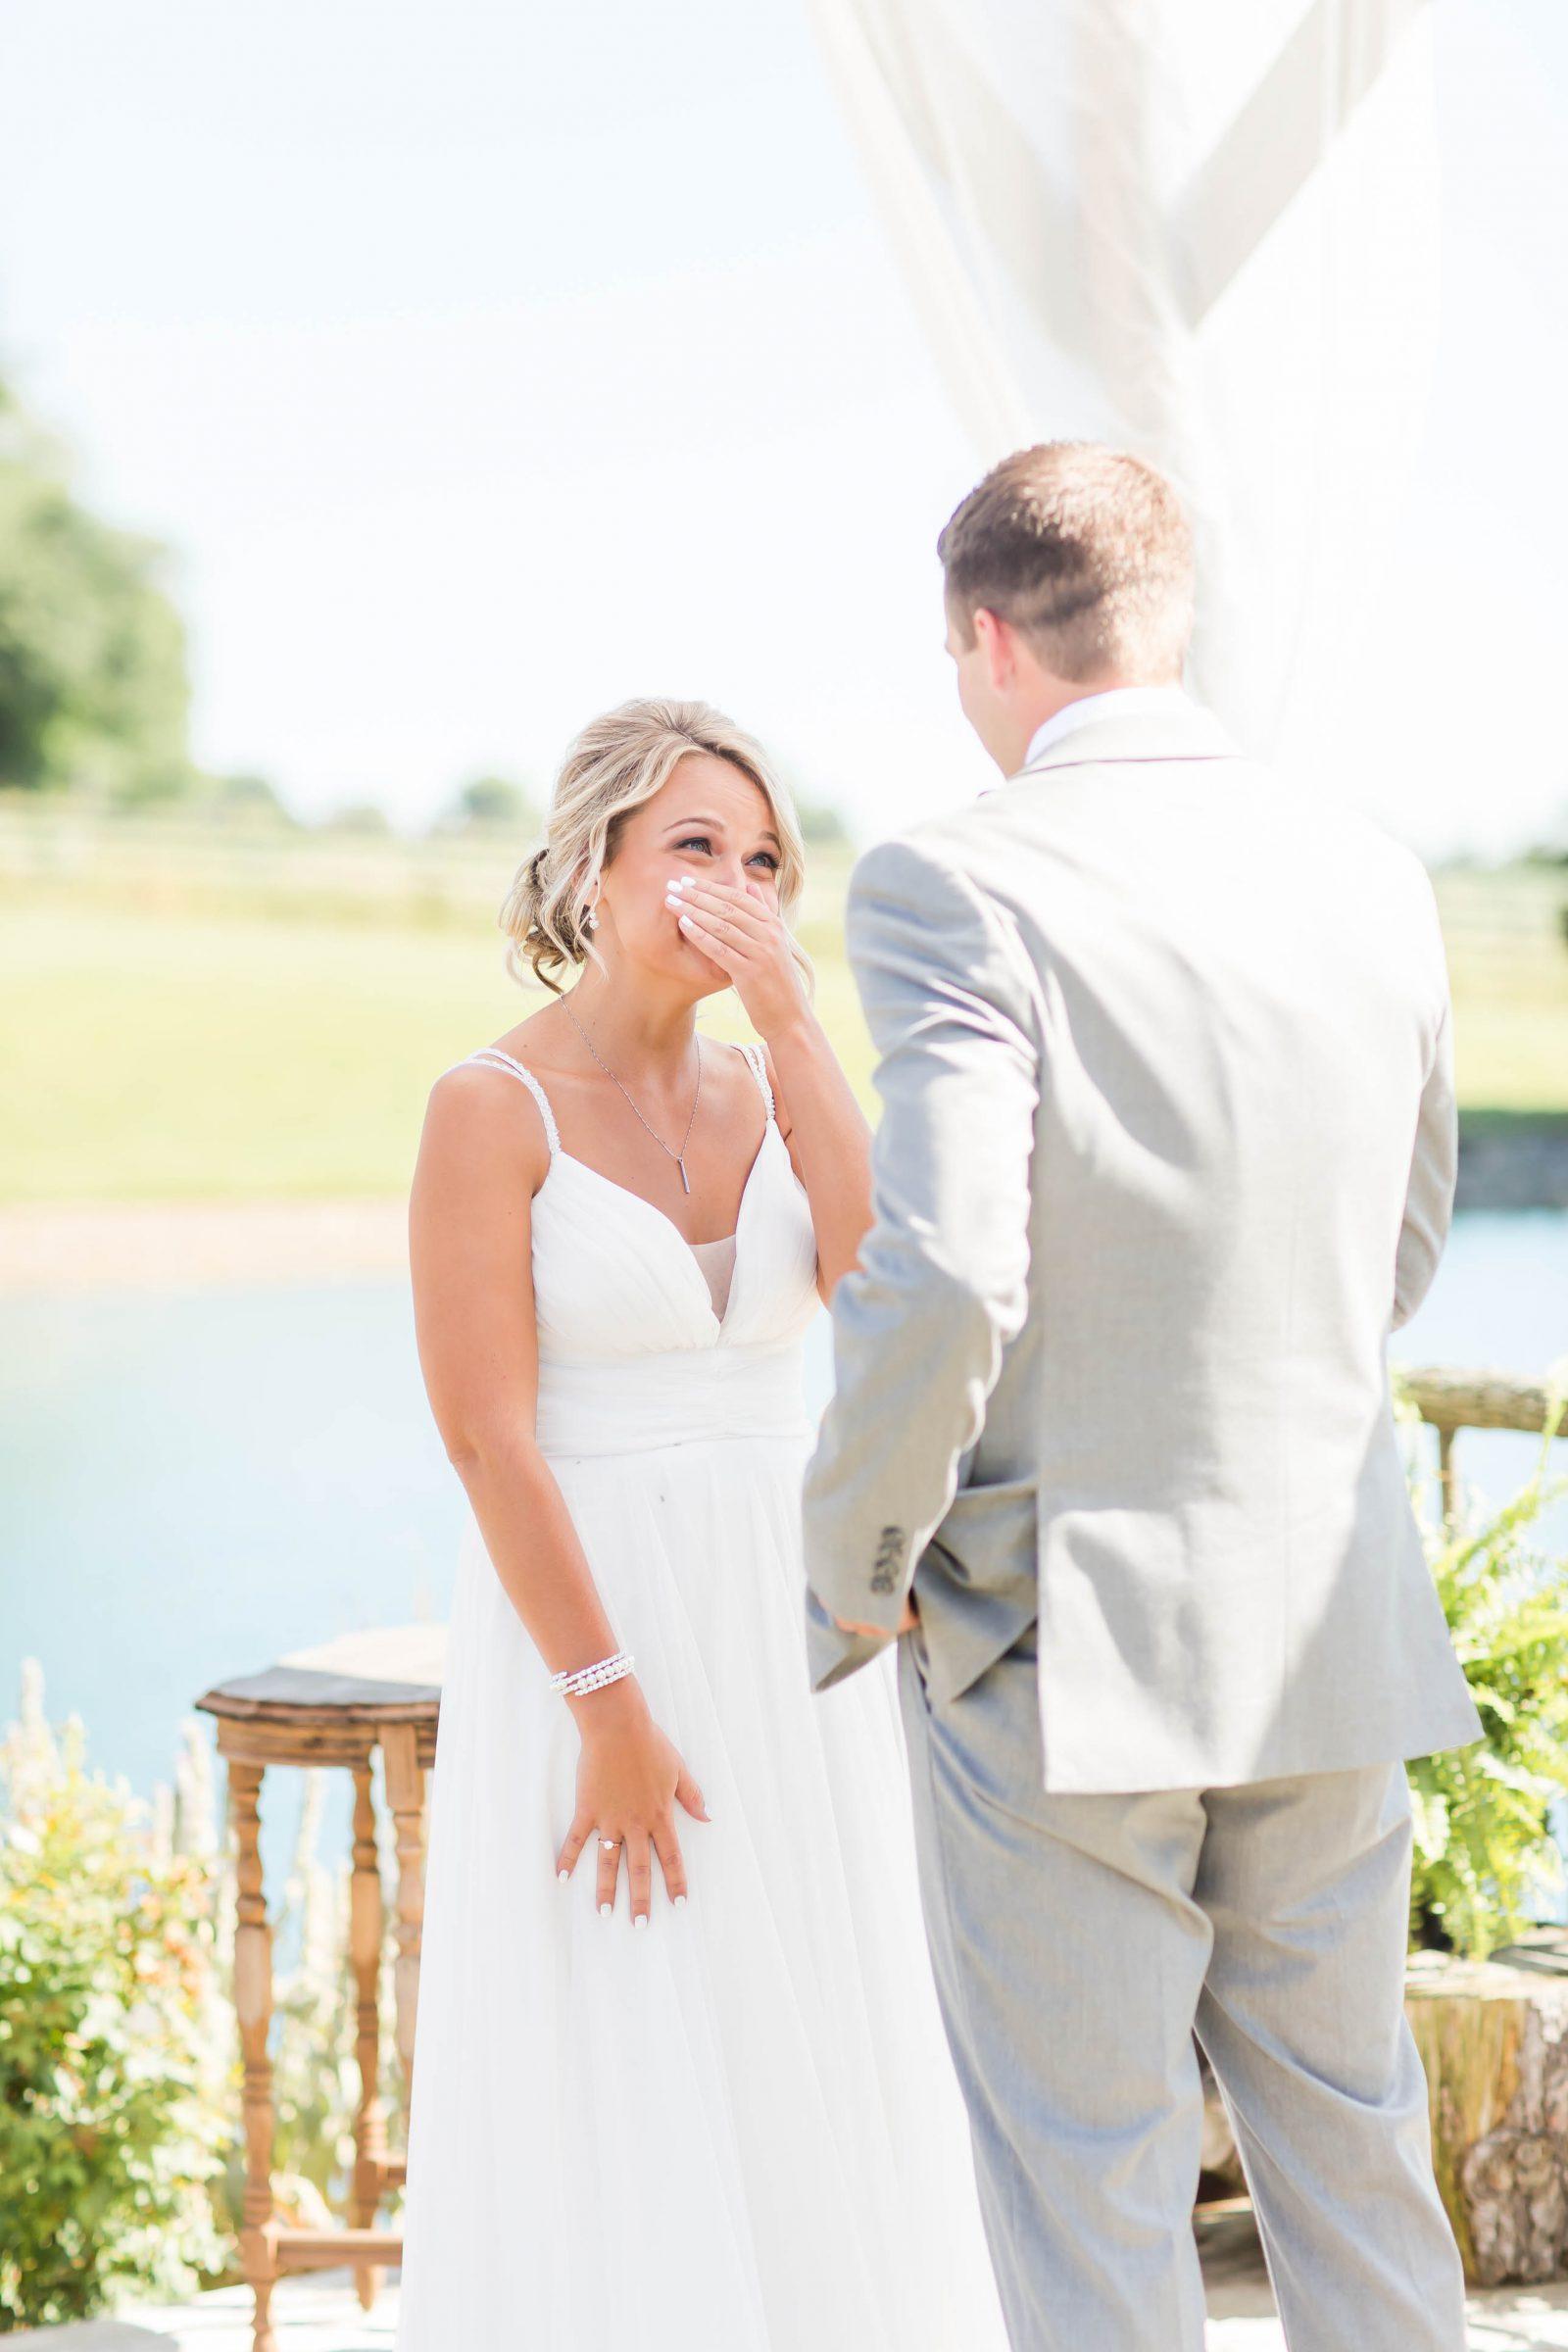 peacock-ridge-summer-wedding-photographer-akron-ohio-loren-jackson-photography-77